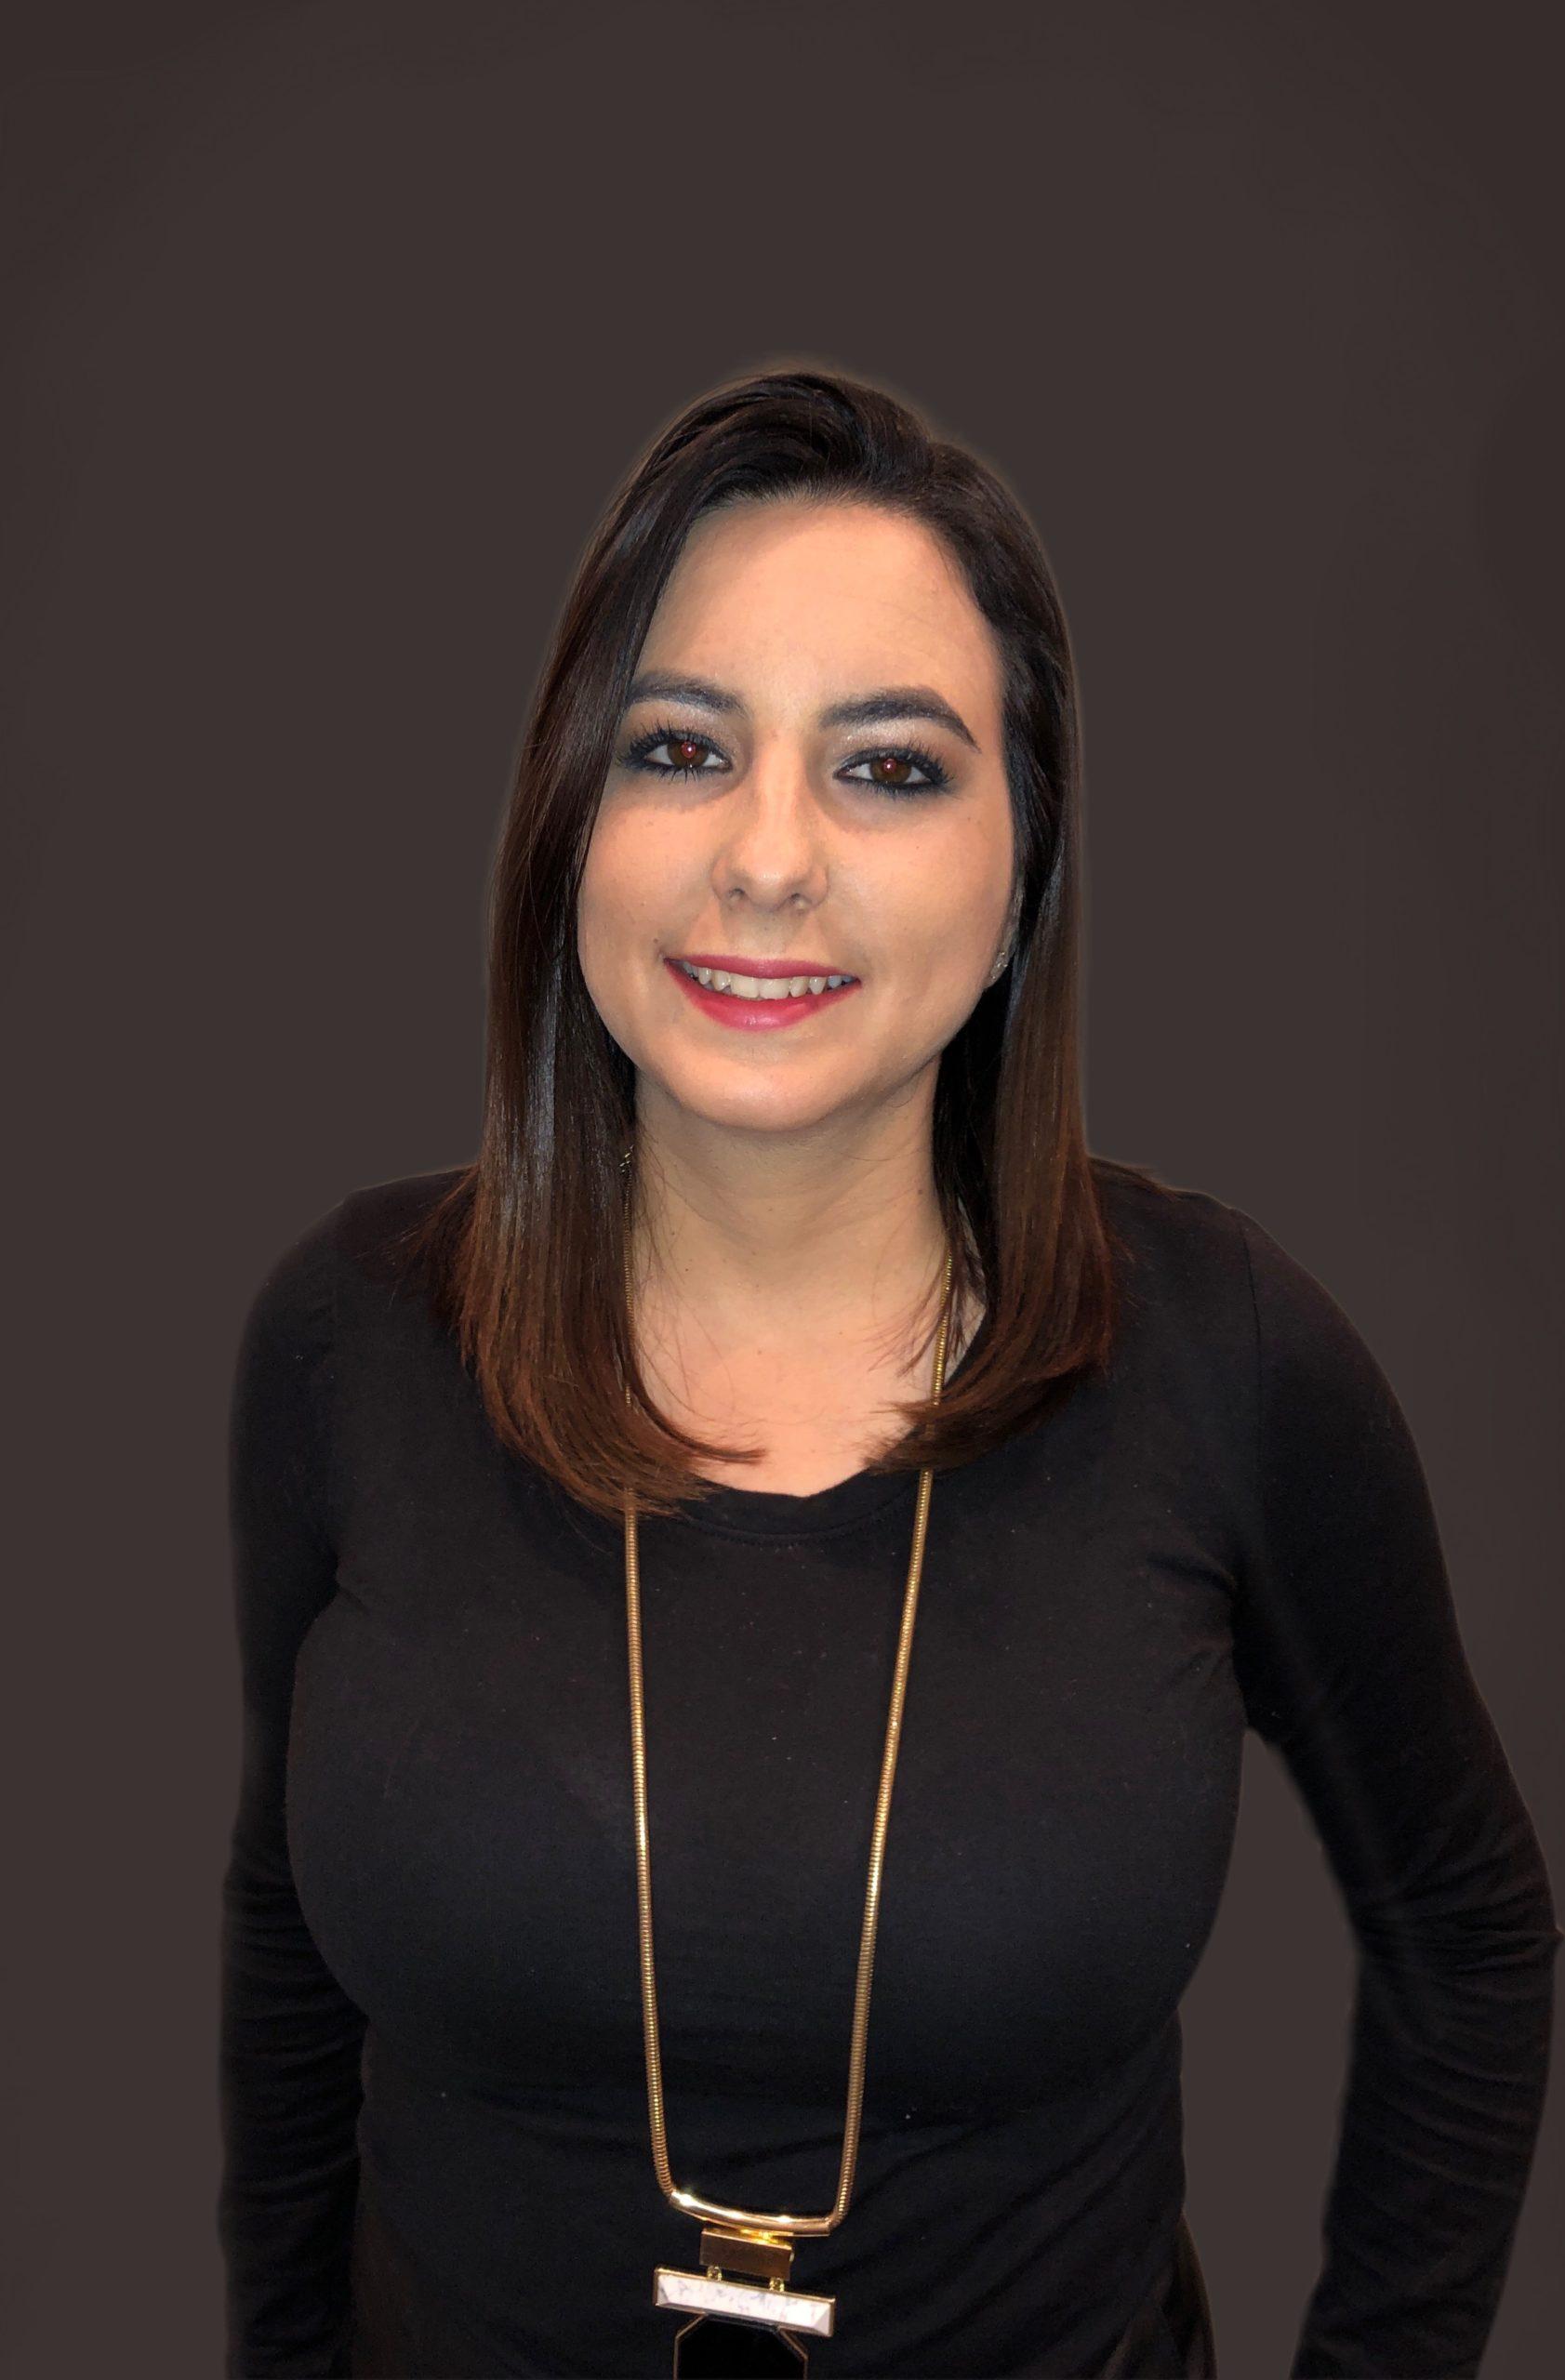 Stephanie Arias